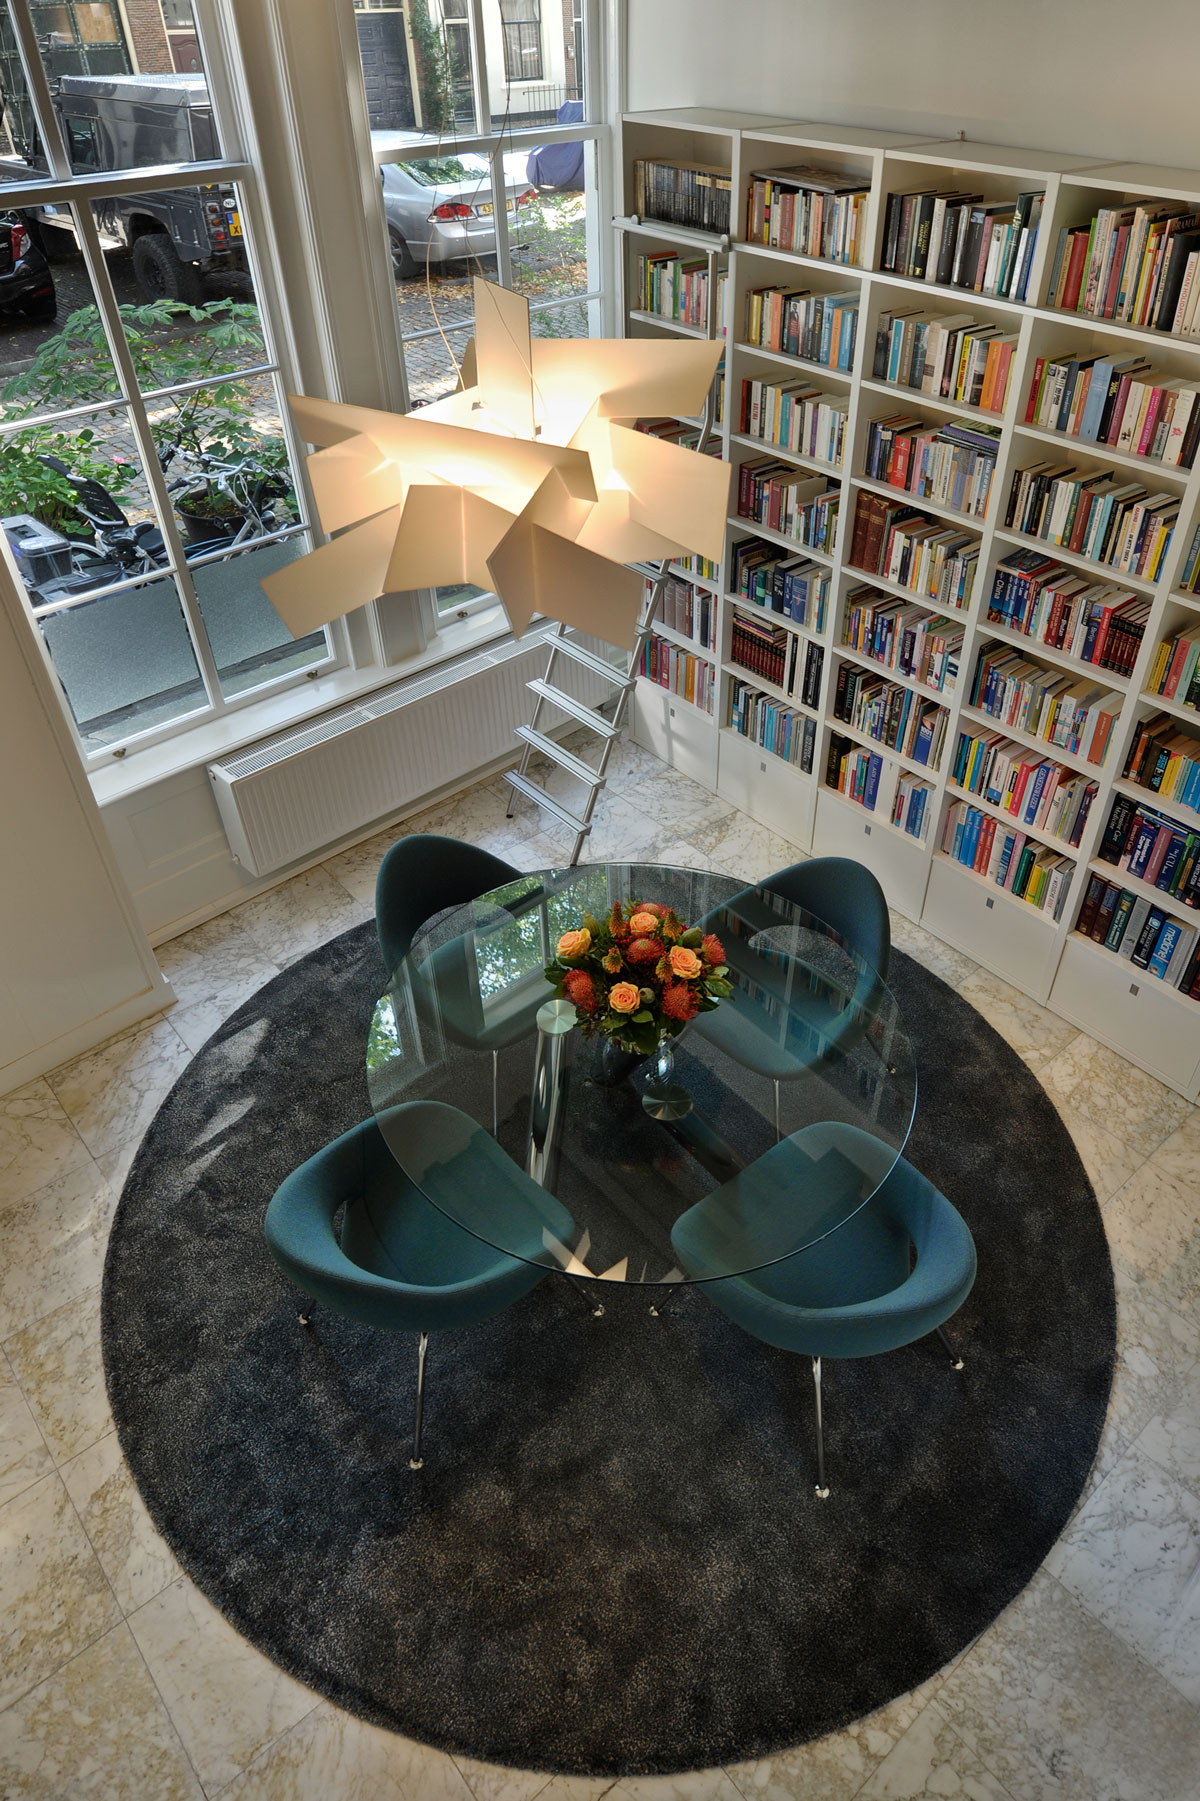 Interieur, boekenkast, bibliotheek, grote ramen, salontafel, herenhuis, Van Oort Interieurs